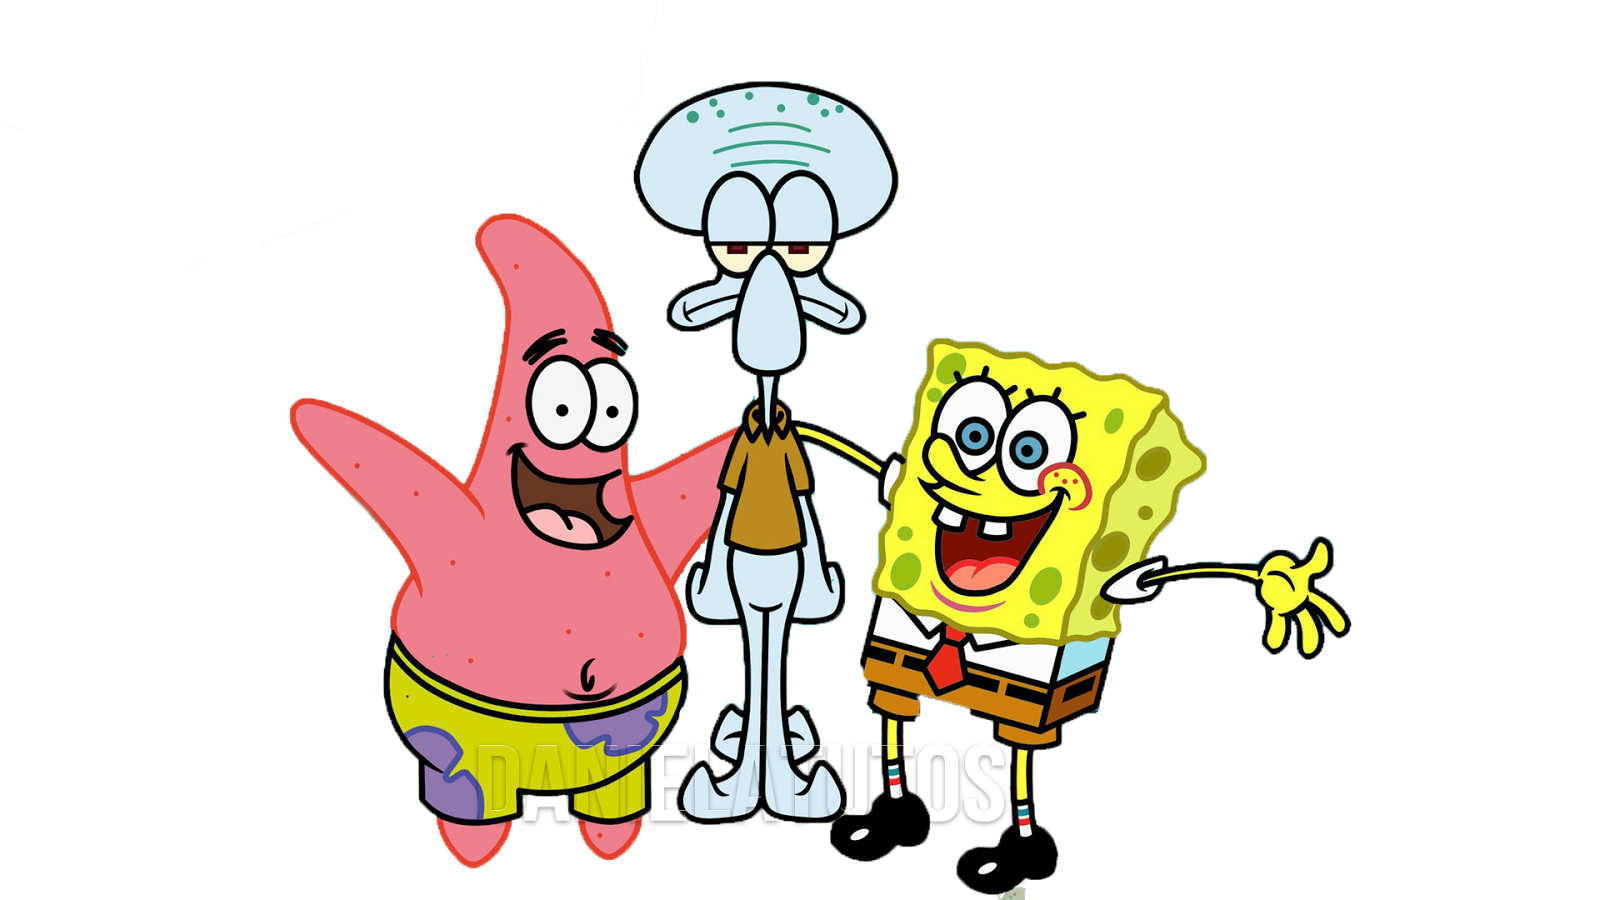 Cartoon Characters Png : Cartoon characters bob png